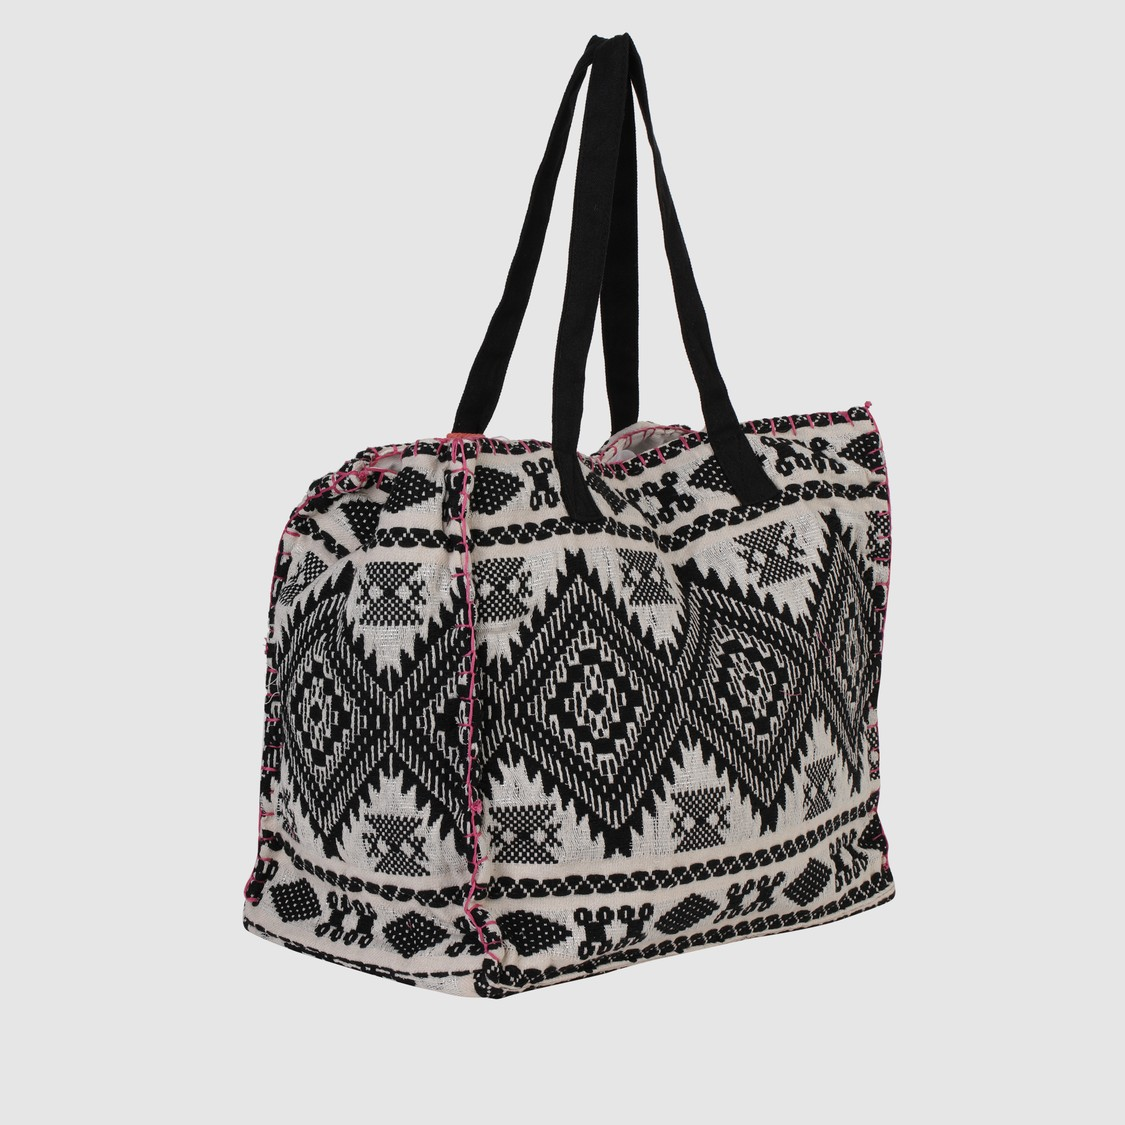 Embroidered Handbag with Snap Closure